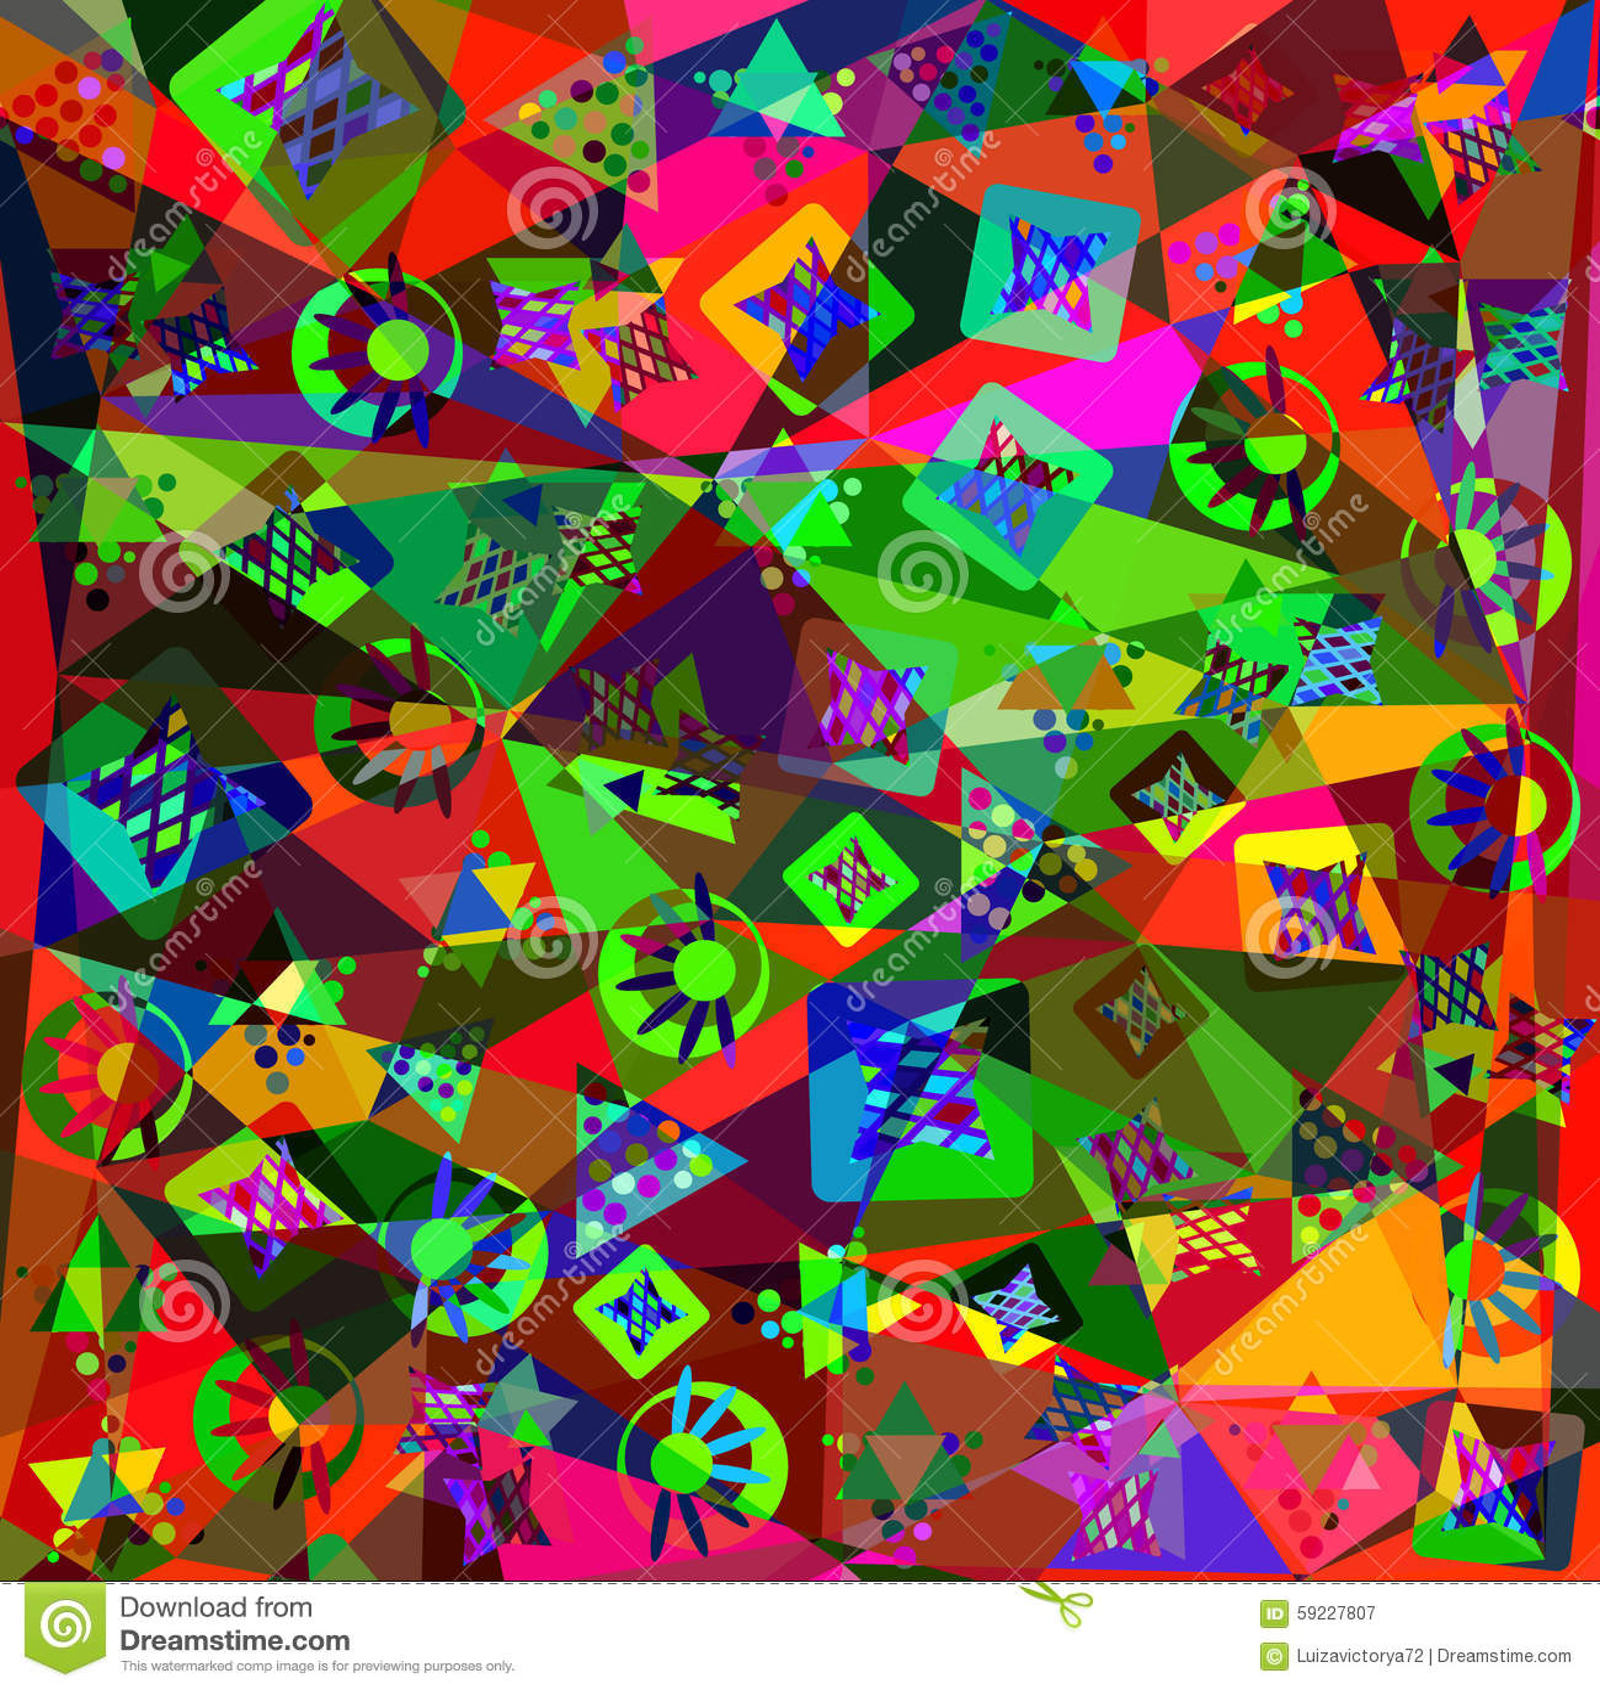 Fondo moderno abstracto colorido, ejemplo